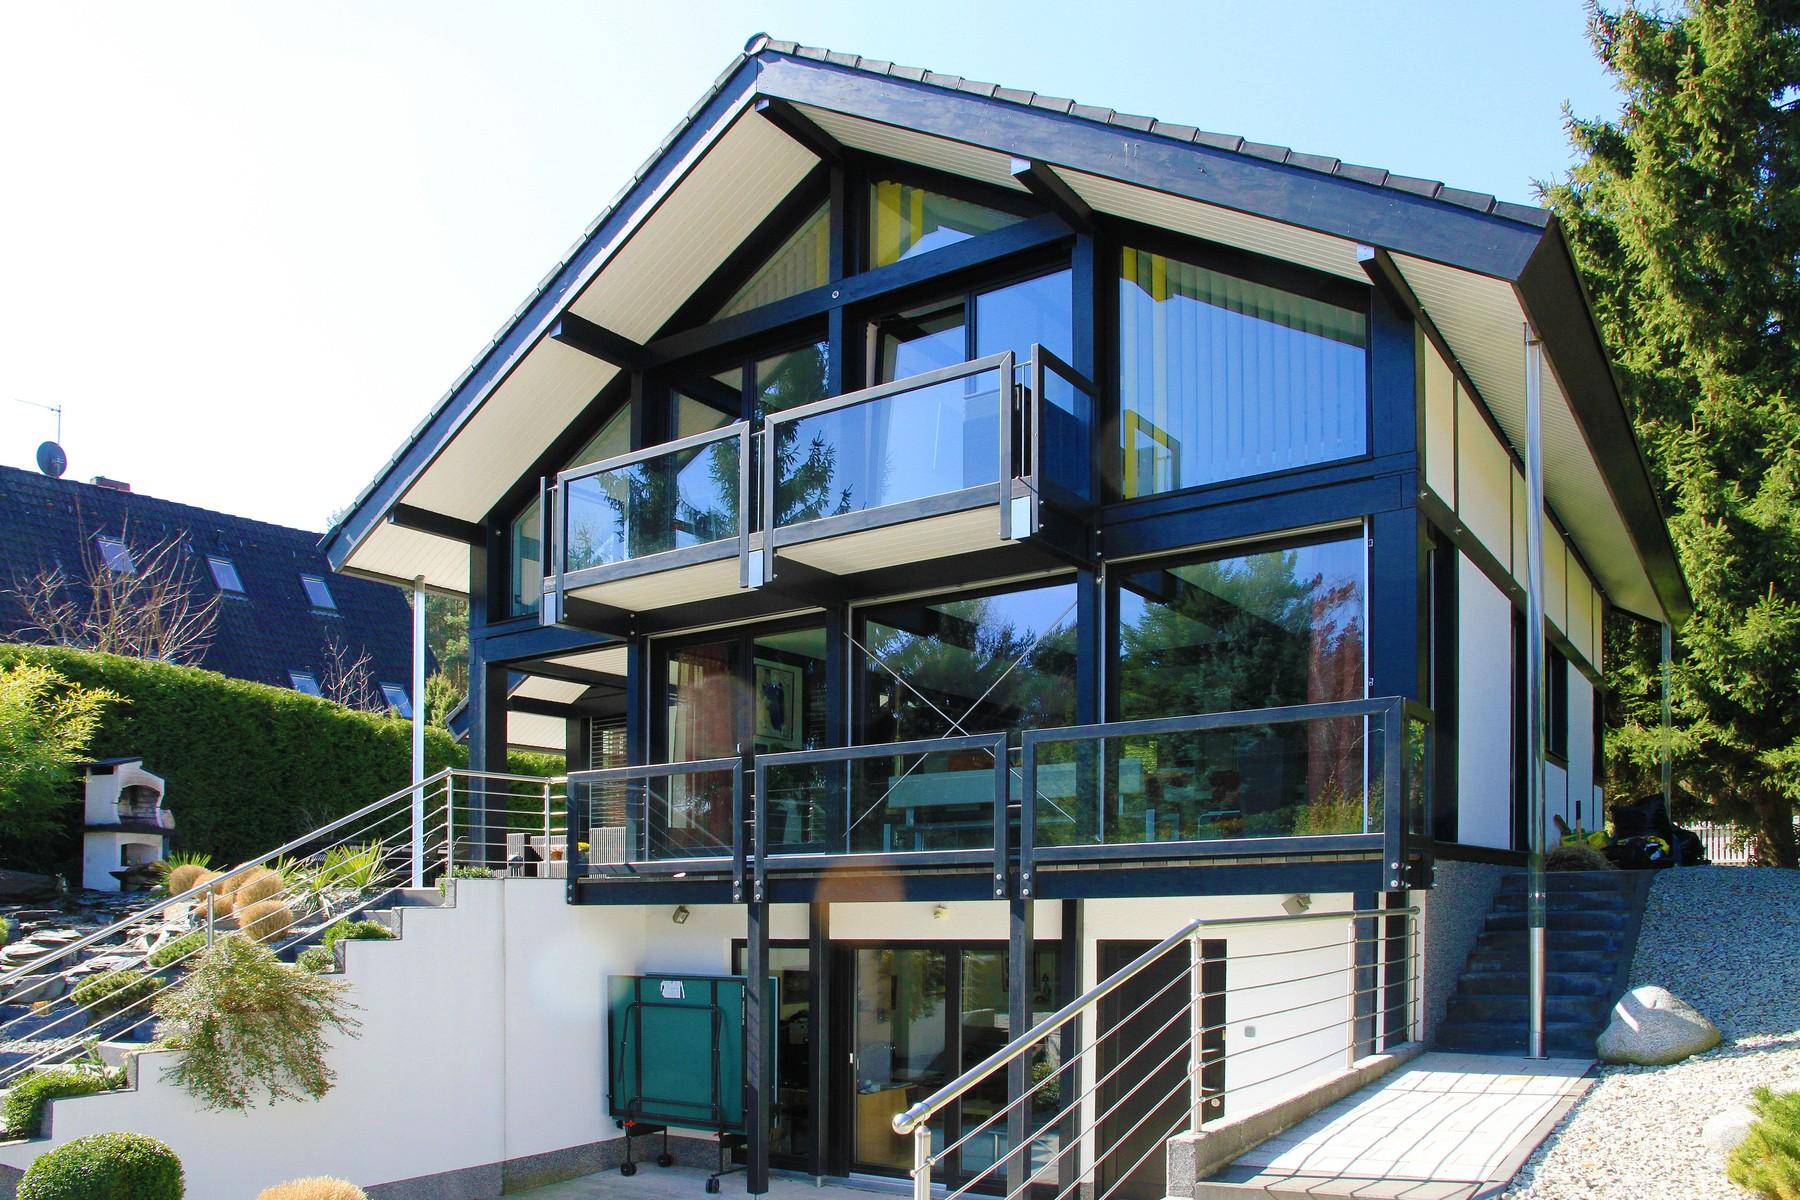 fachwerkhaus dunkle konstruktion holz skelett haus landhaus 5 concentus moderne fachwerkh user. Black Bedroom Furniture Sets. Home Design Ideas